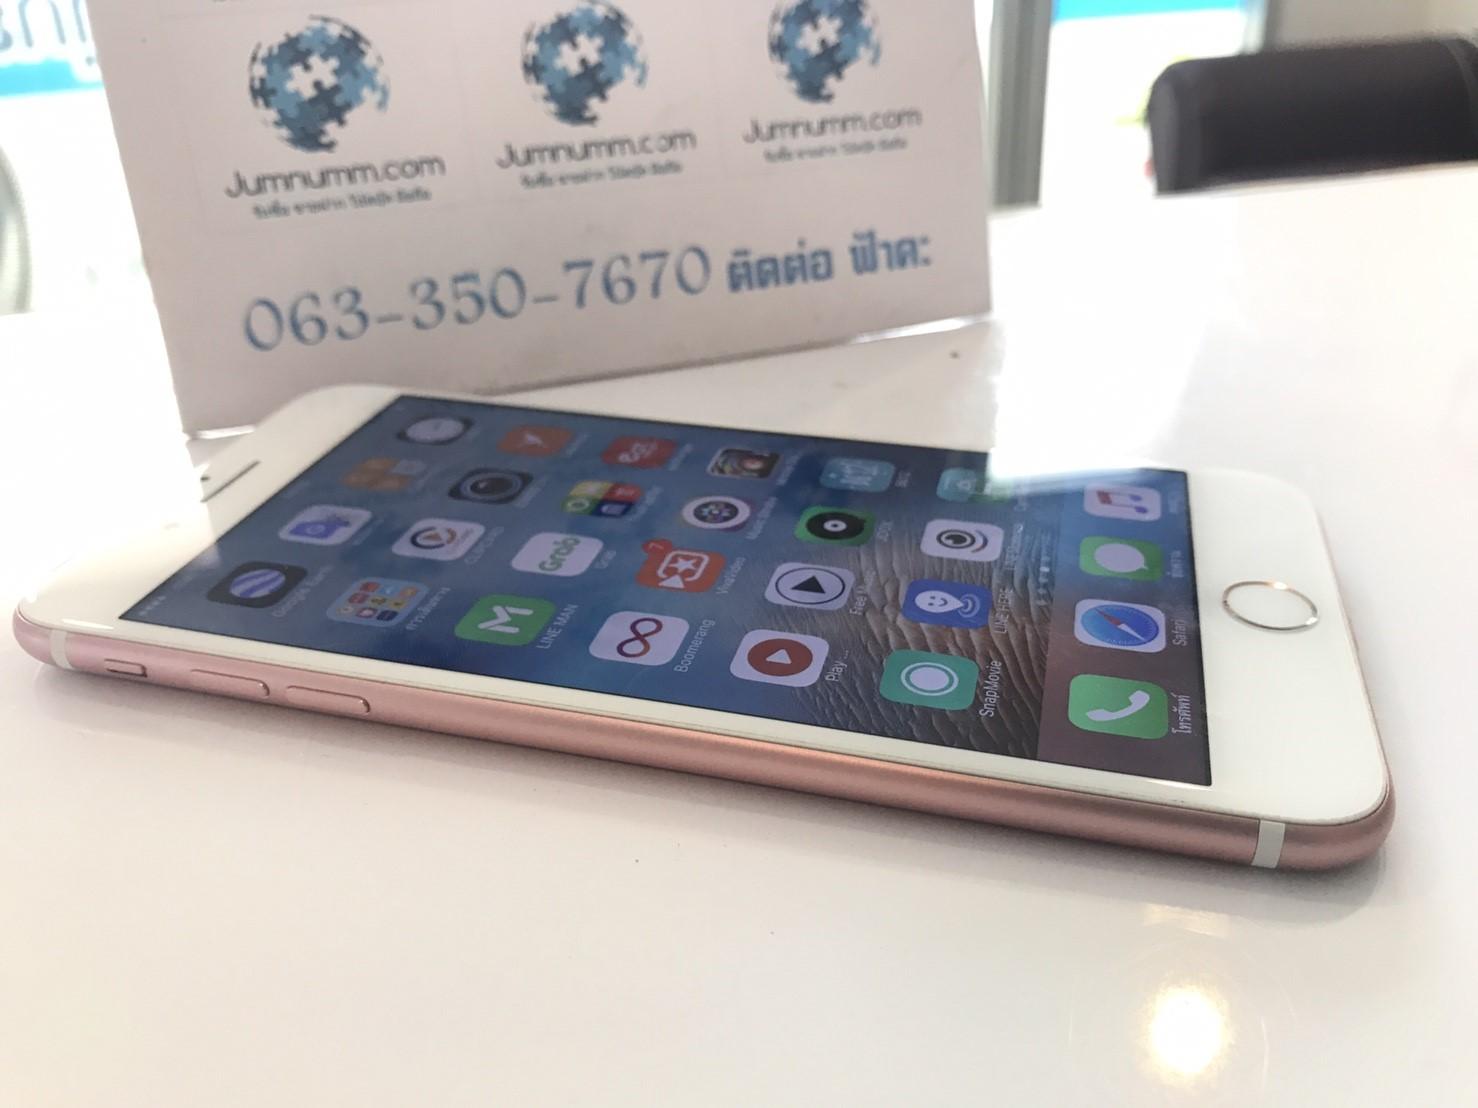 JMM-49 ขาย IPhone7 Plus 36GB Pink ราคา 21500 บาท